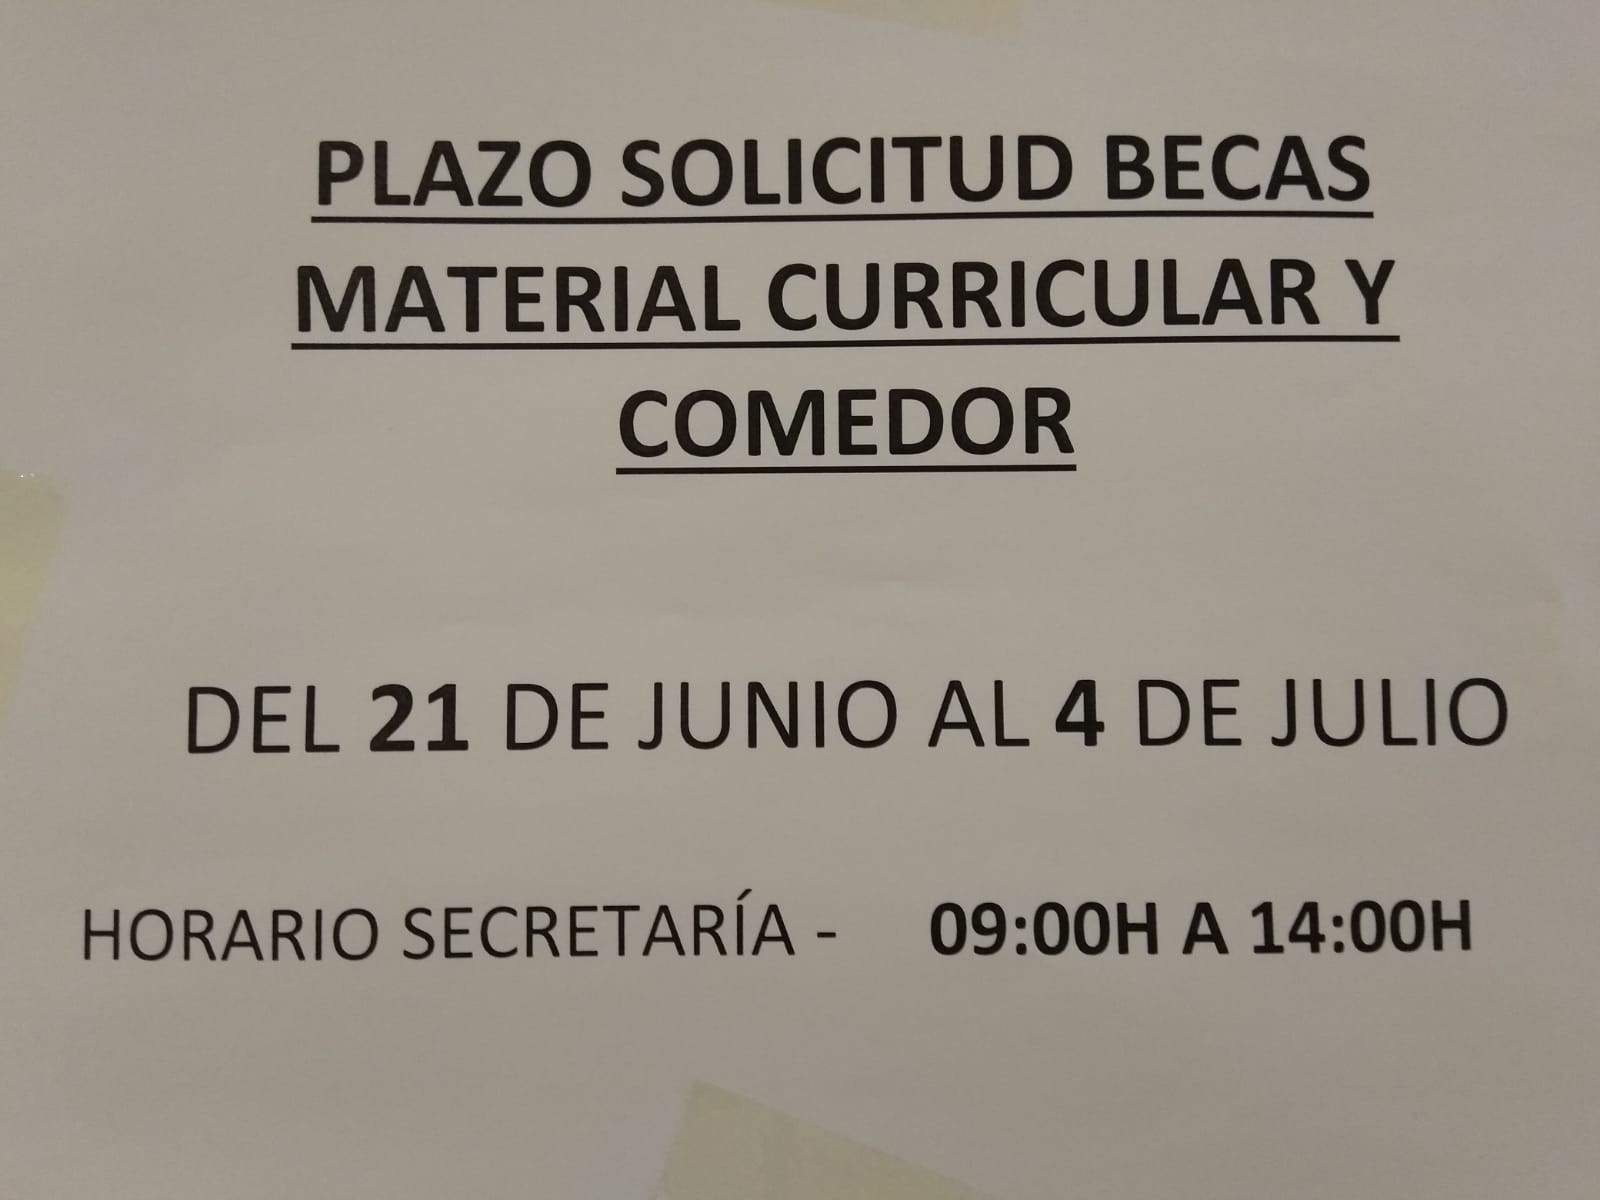 APA CP SAN BRAULIO (Zaragoza): BECAS COMEDOR Y MATERIAL CURRICULAR